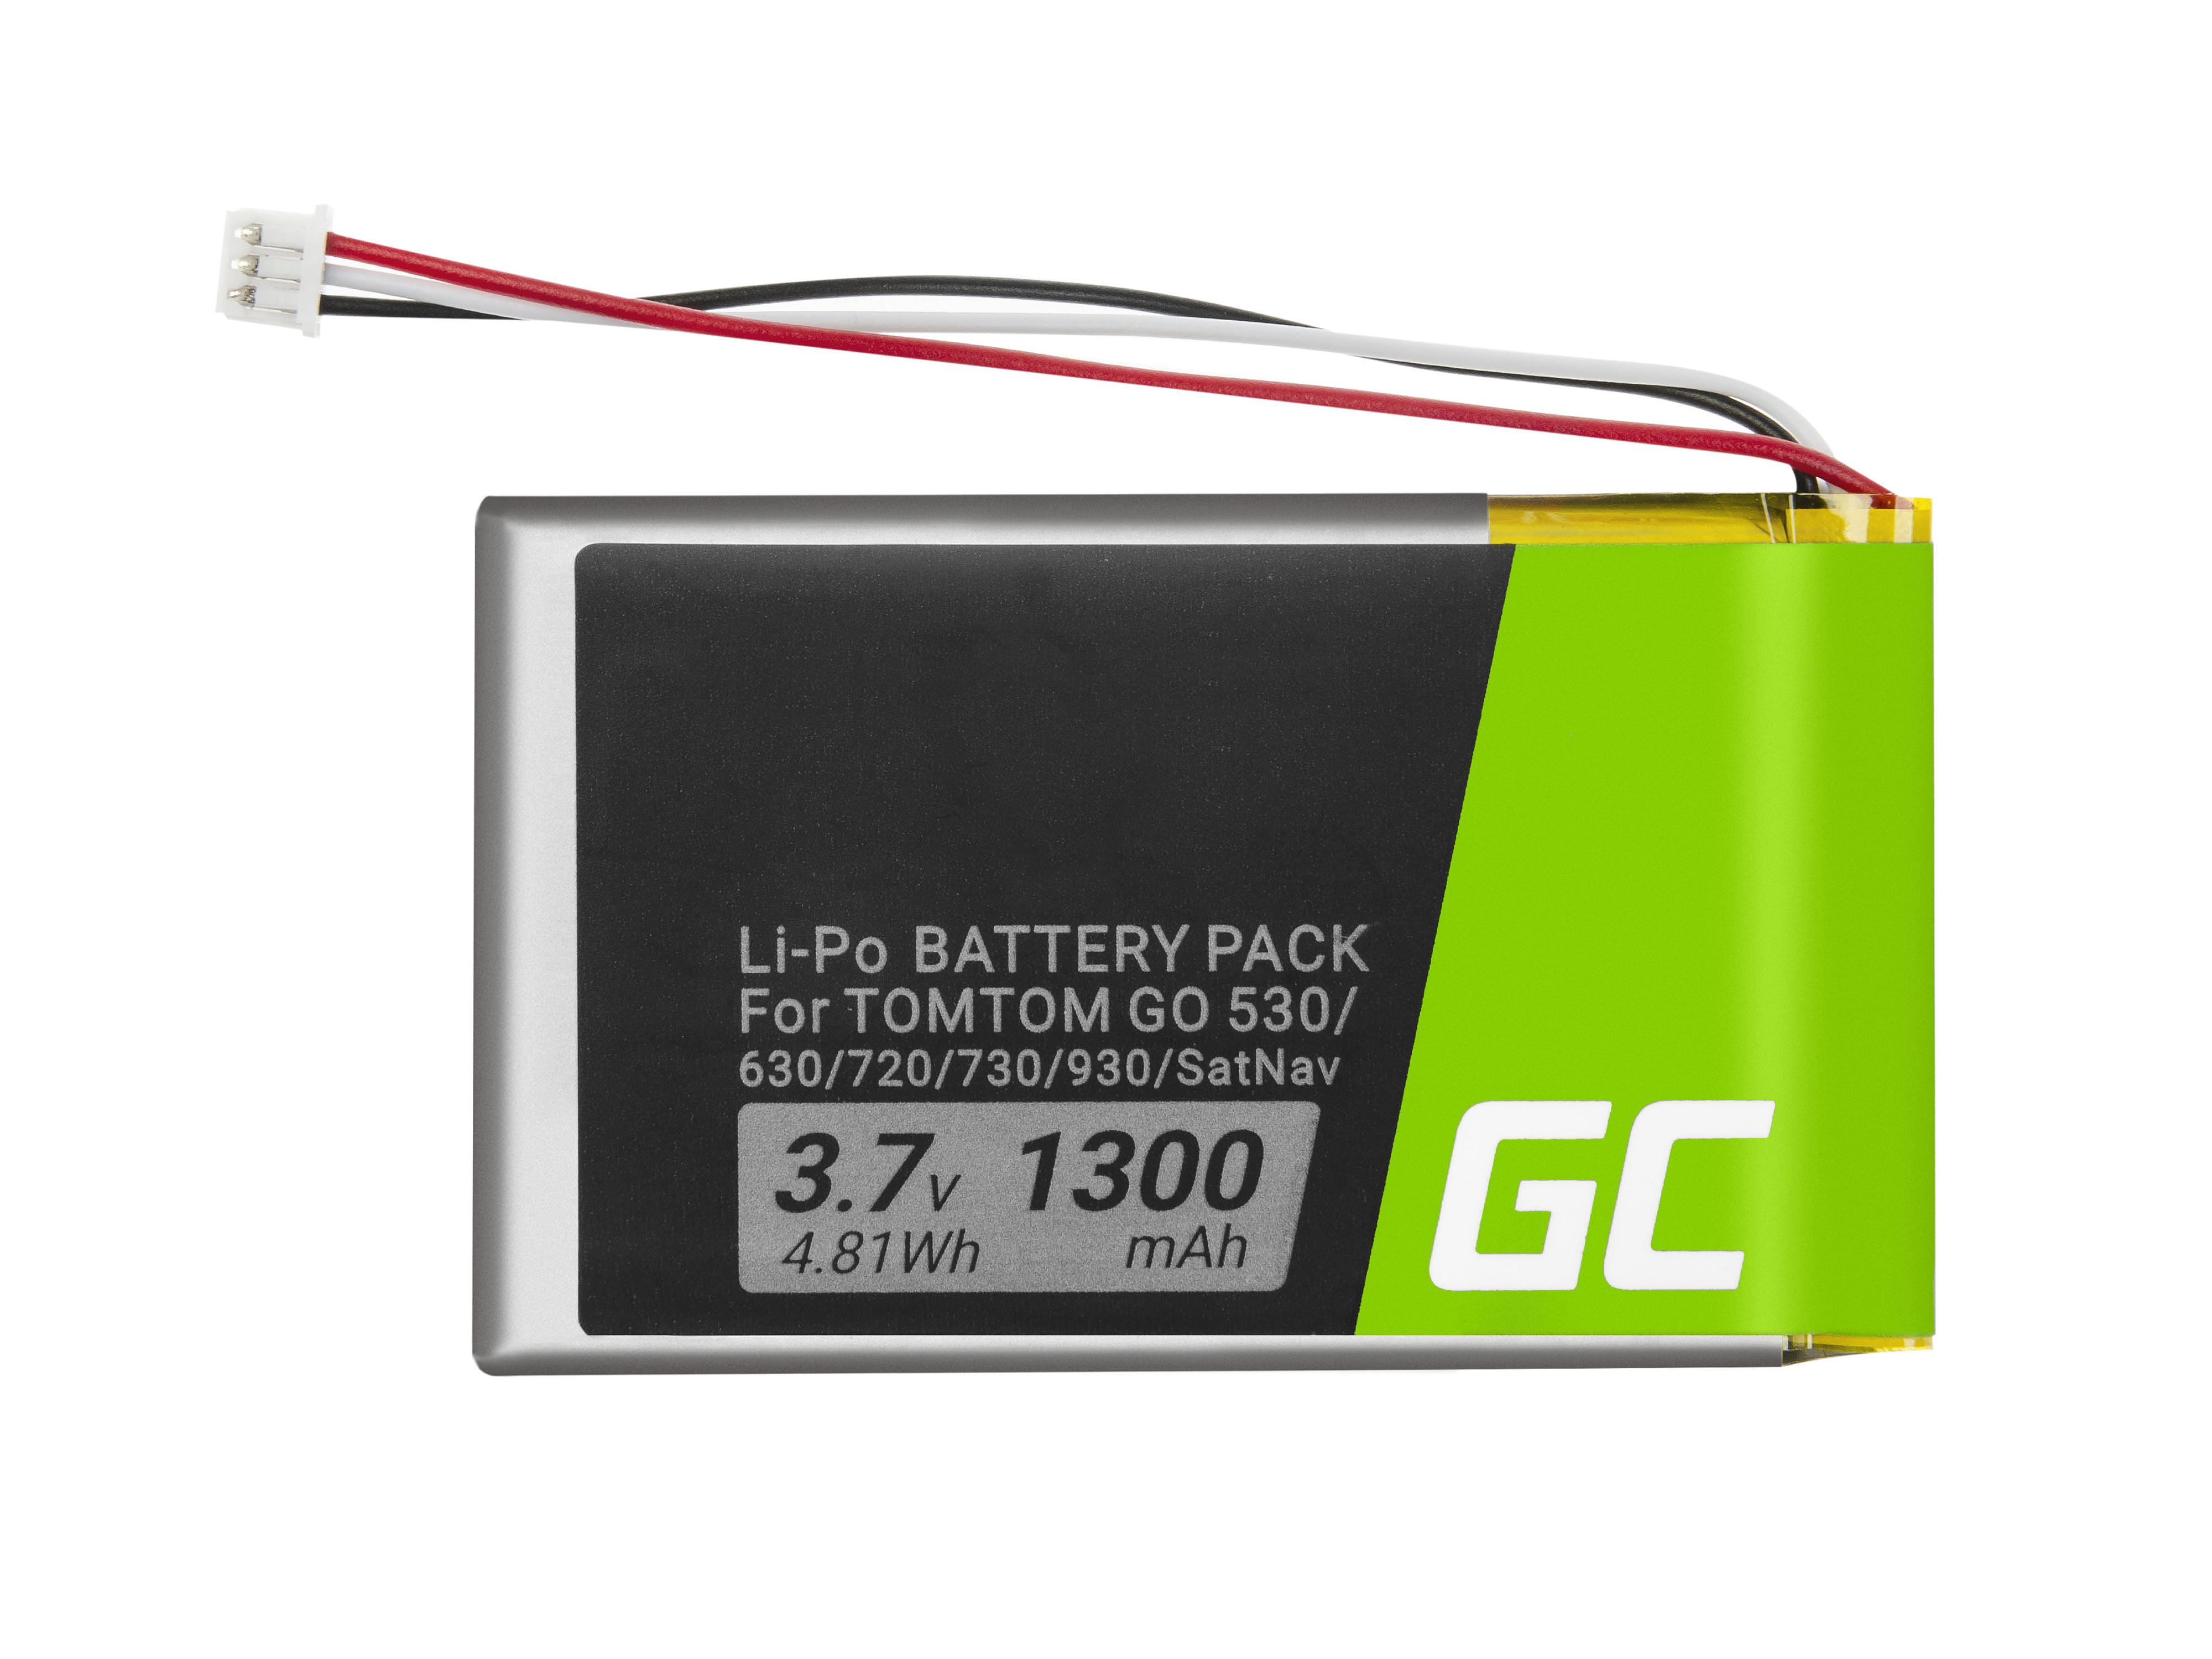 Green Cell Baterie TomTom AHL03714000 VF8 1697461 pro TomTom GO 530 630 630T 720 730 730T 930 930T SatNav 1300mAh Li-Pol – neoriginální